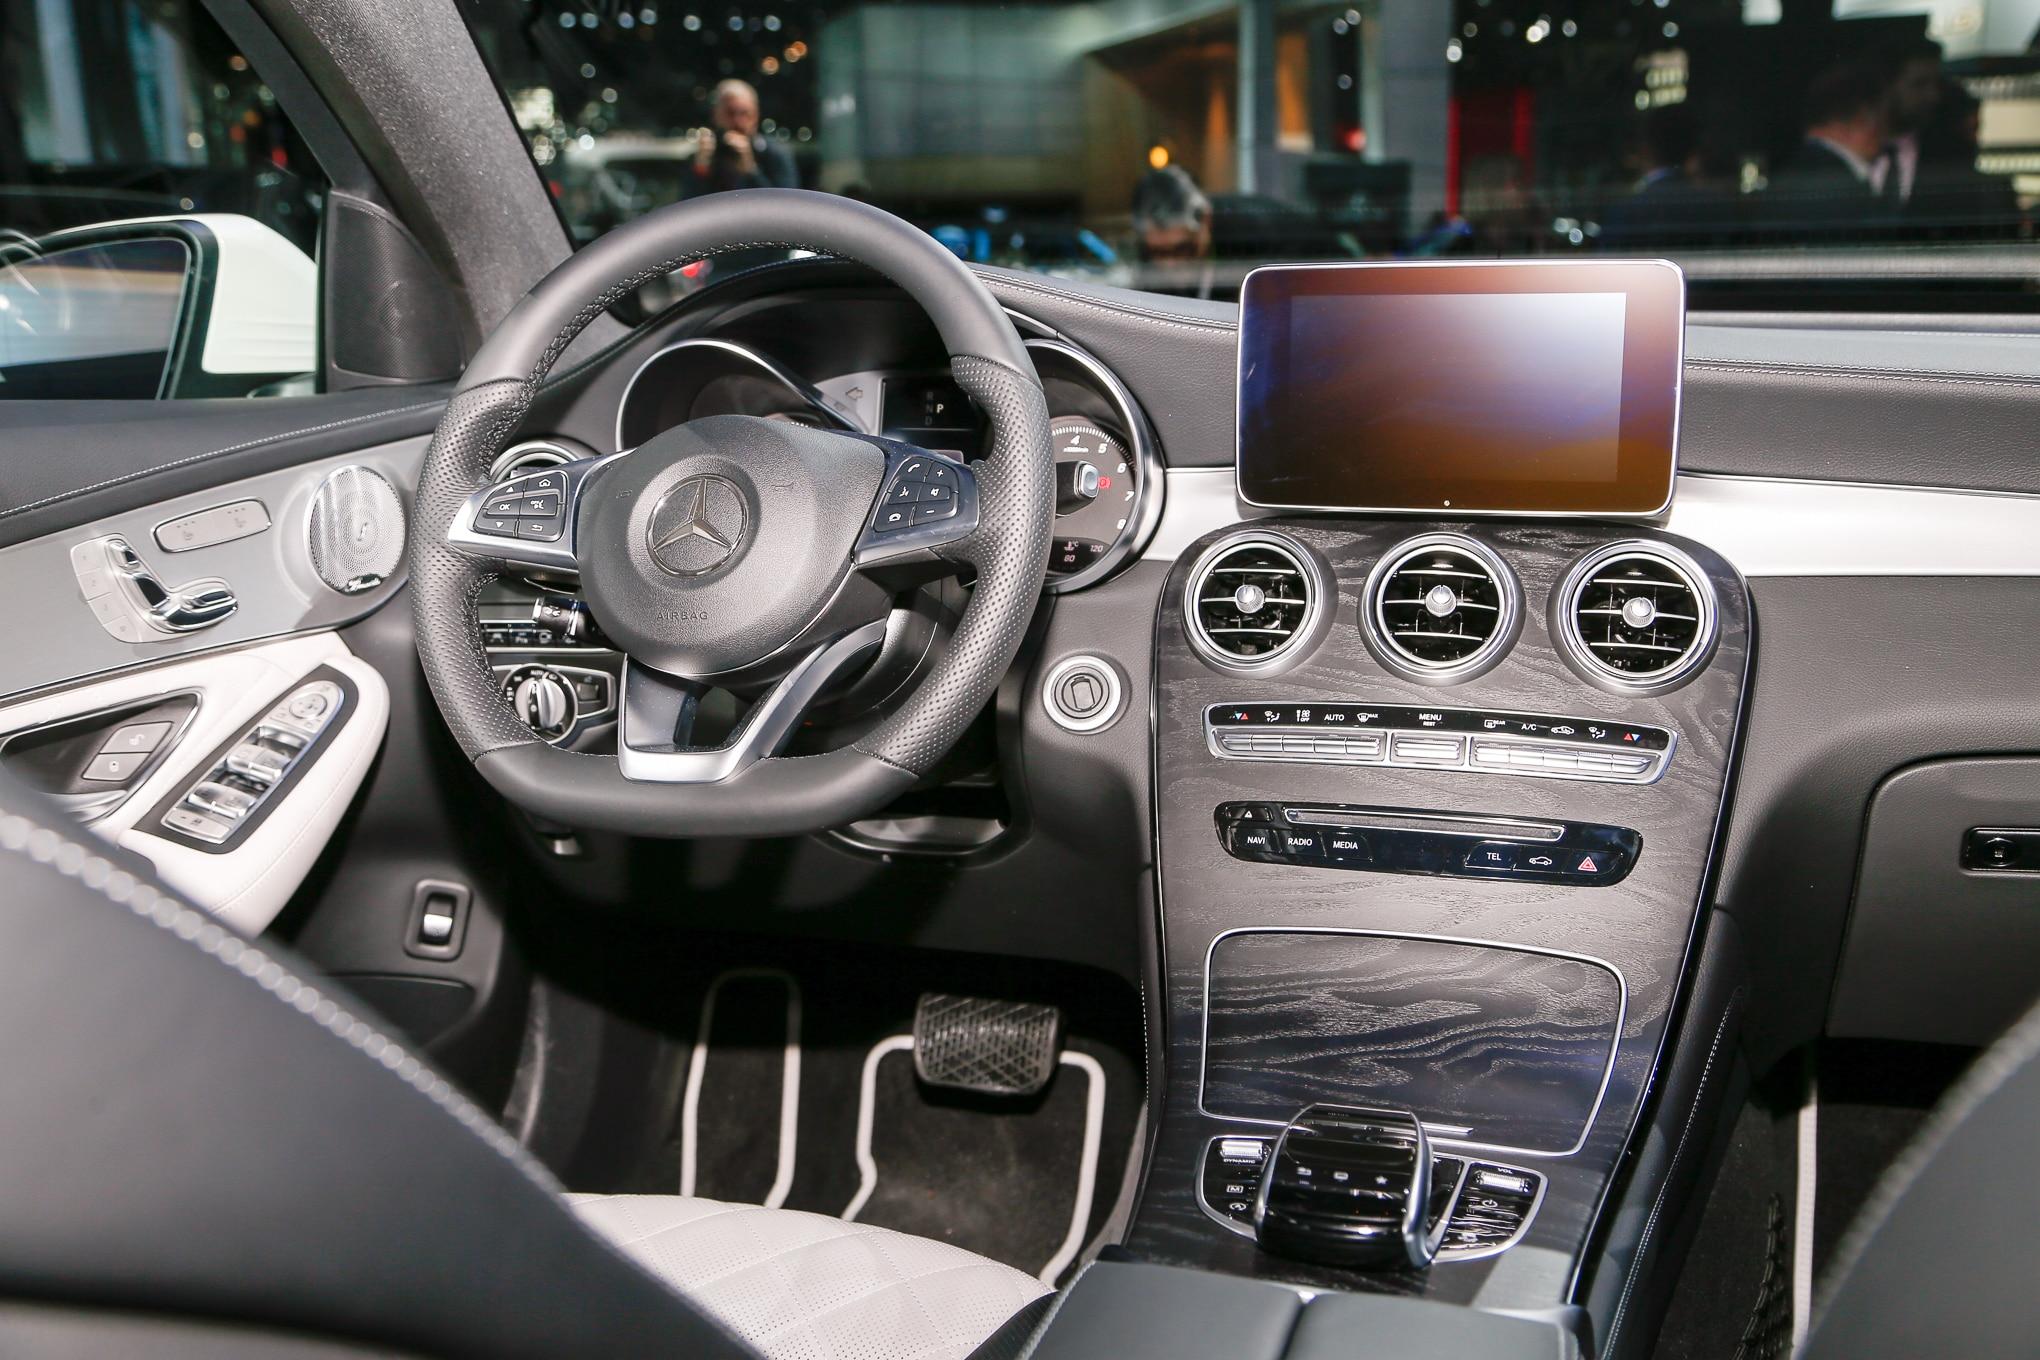 https://st.automobilemag.com/uploads/sites/11/2016/03/2017-Mercedes-Benz-GLC-coupe-interior-02.jpg